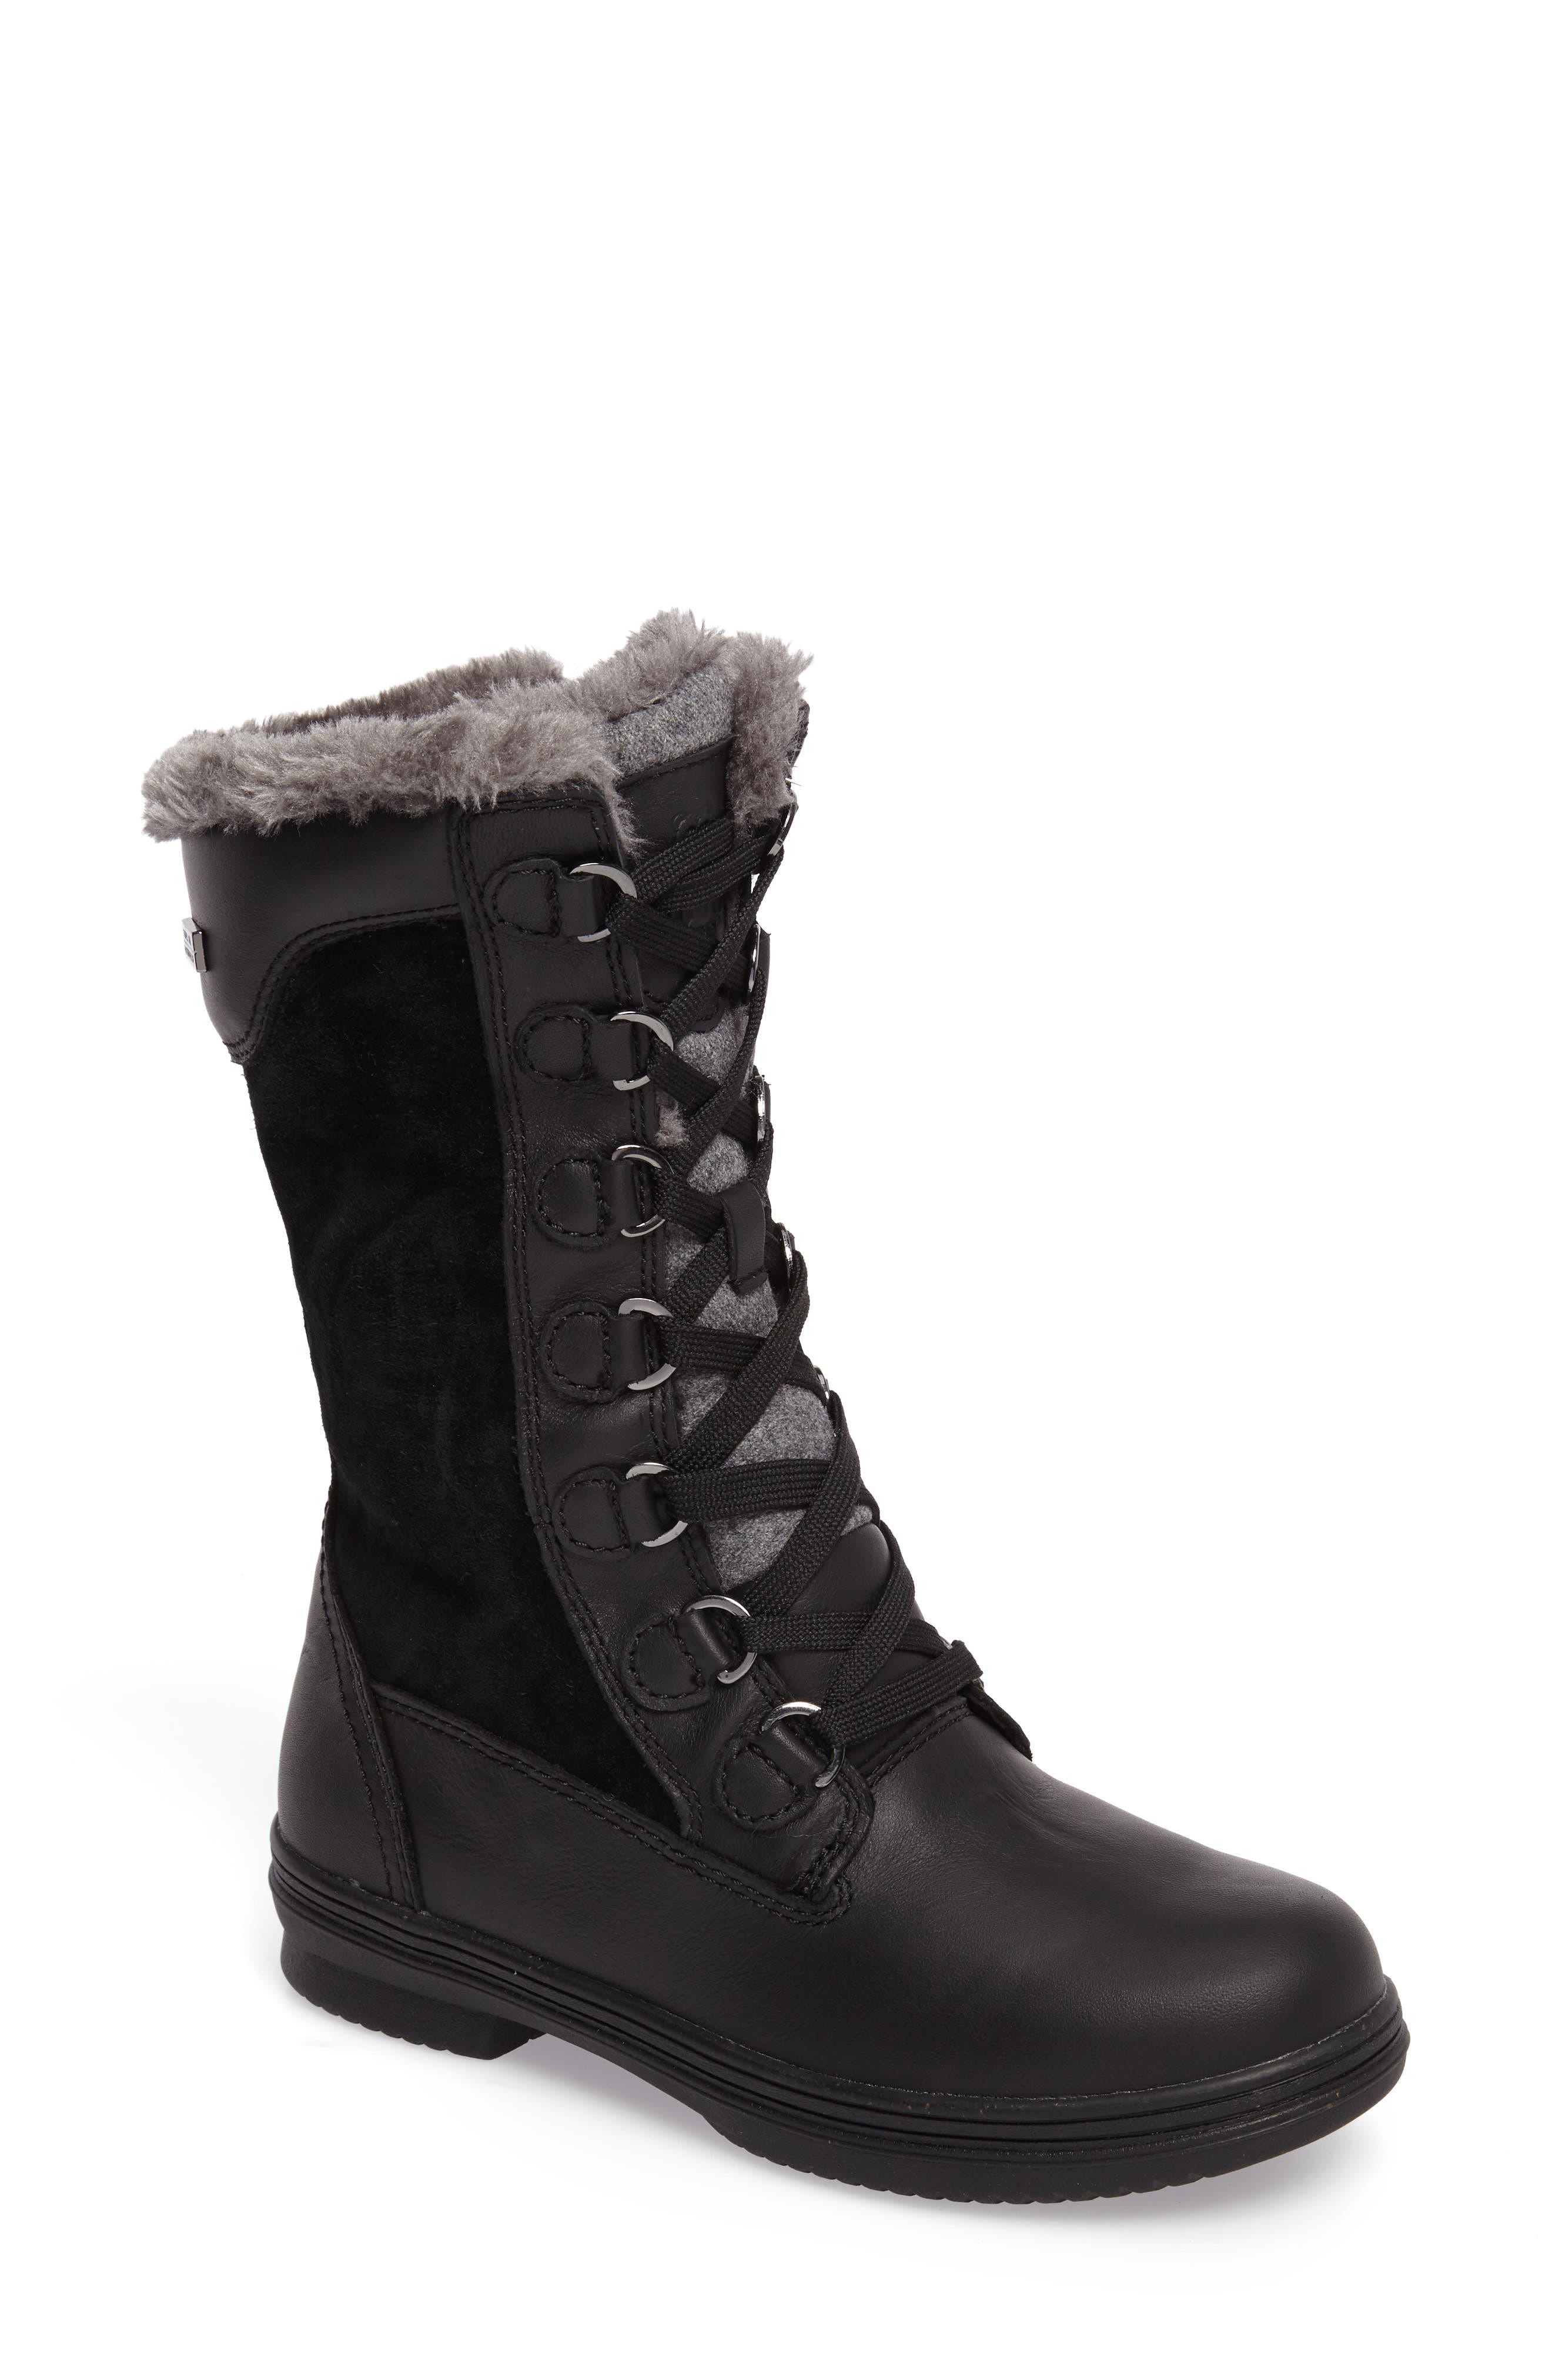 Glata Waterproof Boot,                             Main thumbnail 1, color,                             Black Leather